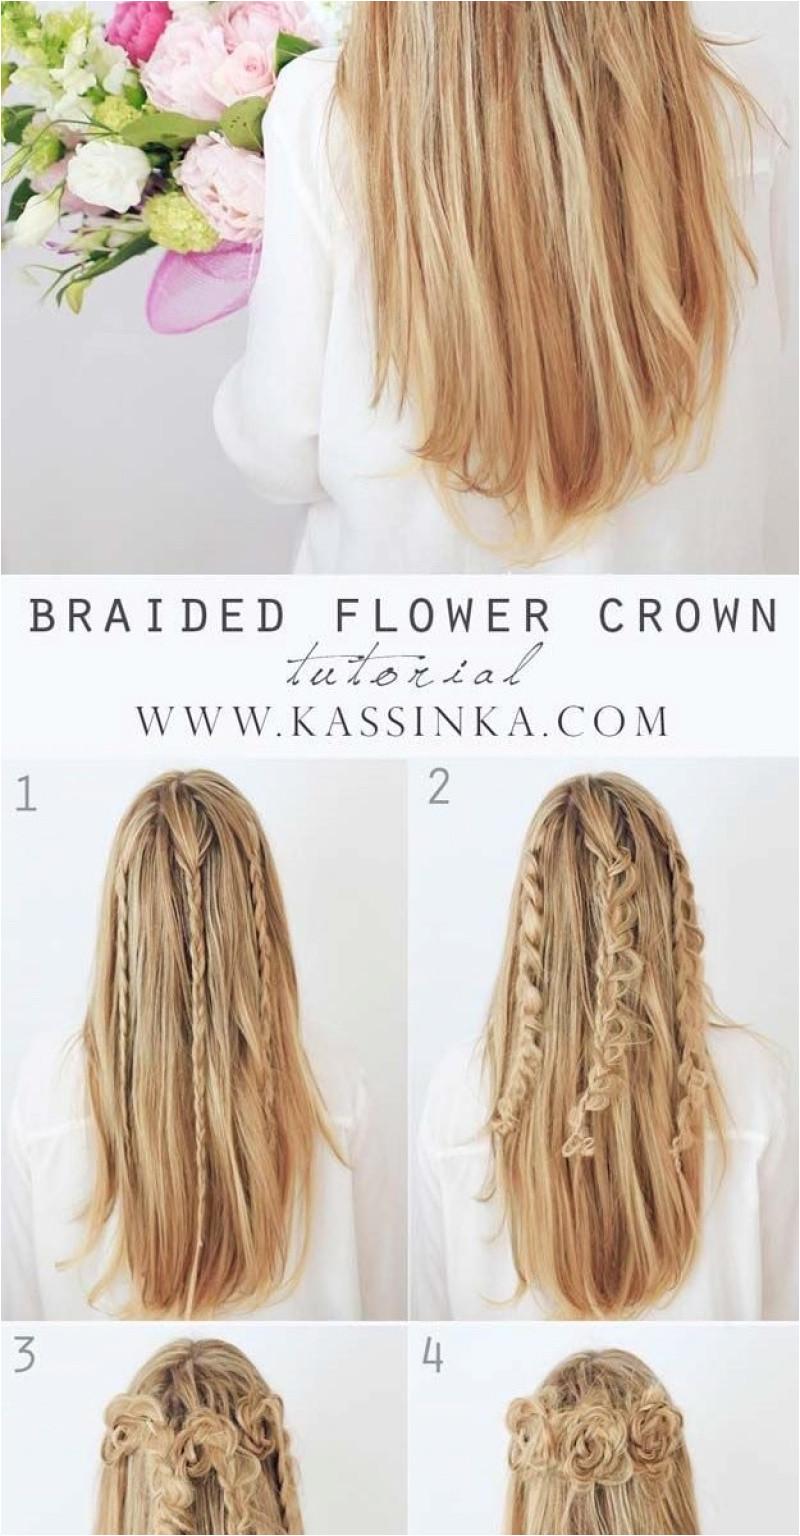 Flower Girl Braided Hairstyles Lovely Cute Easy Fast Hairstyles Best Hairstyle for Medium Hair 0d as